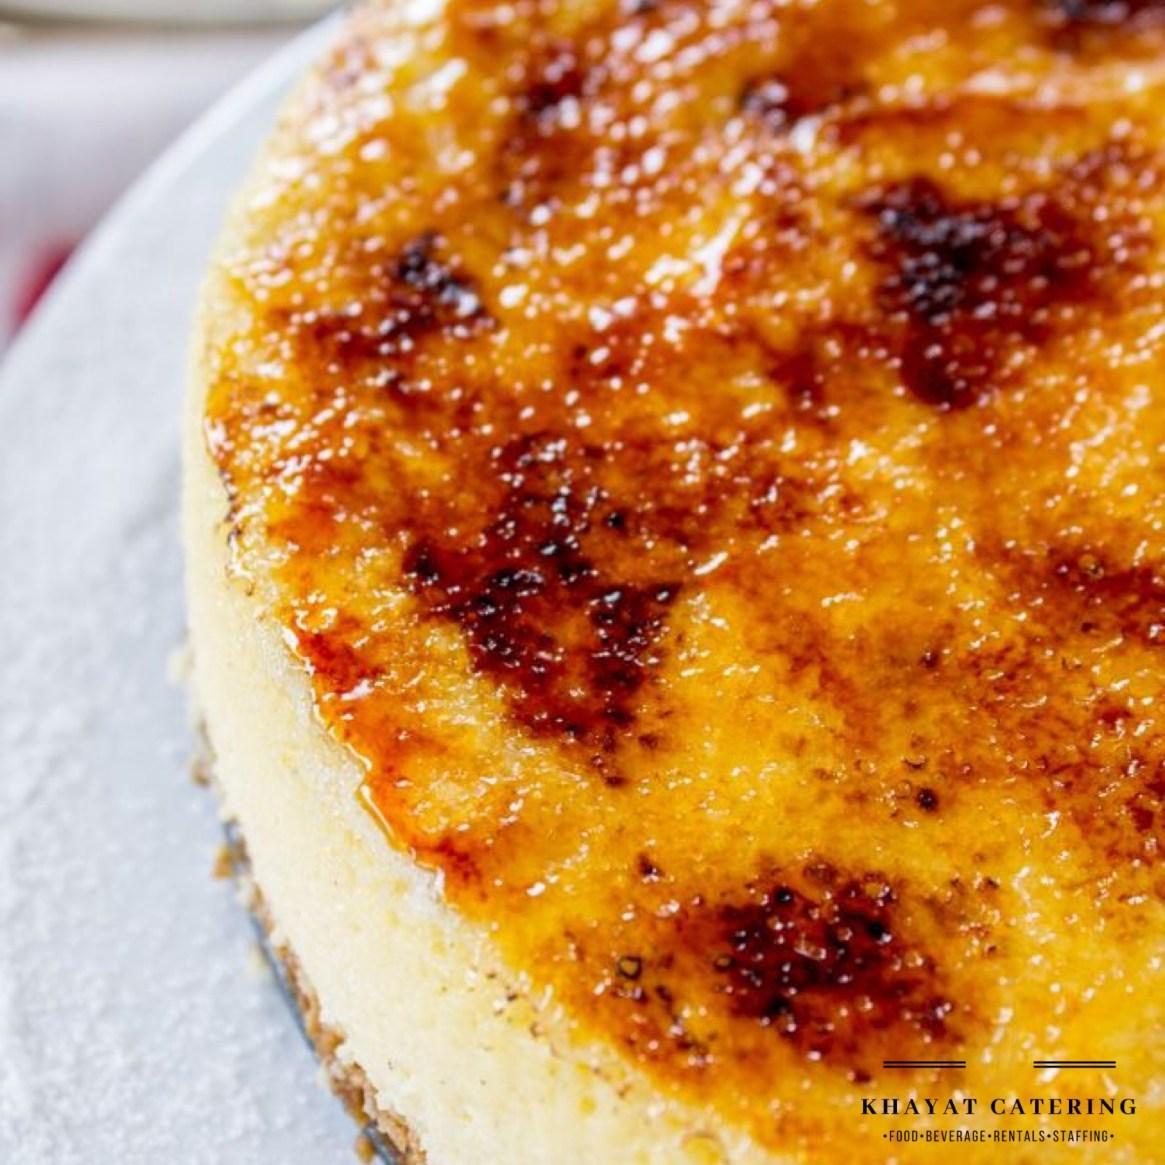 Khayat Catering Creme brûlée cheesecake